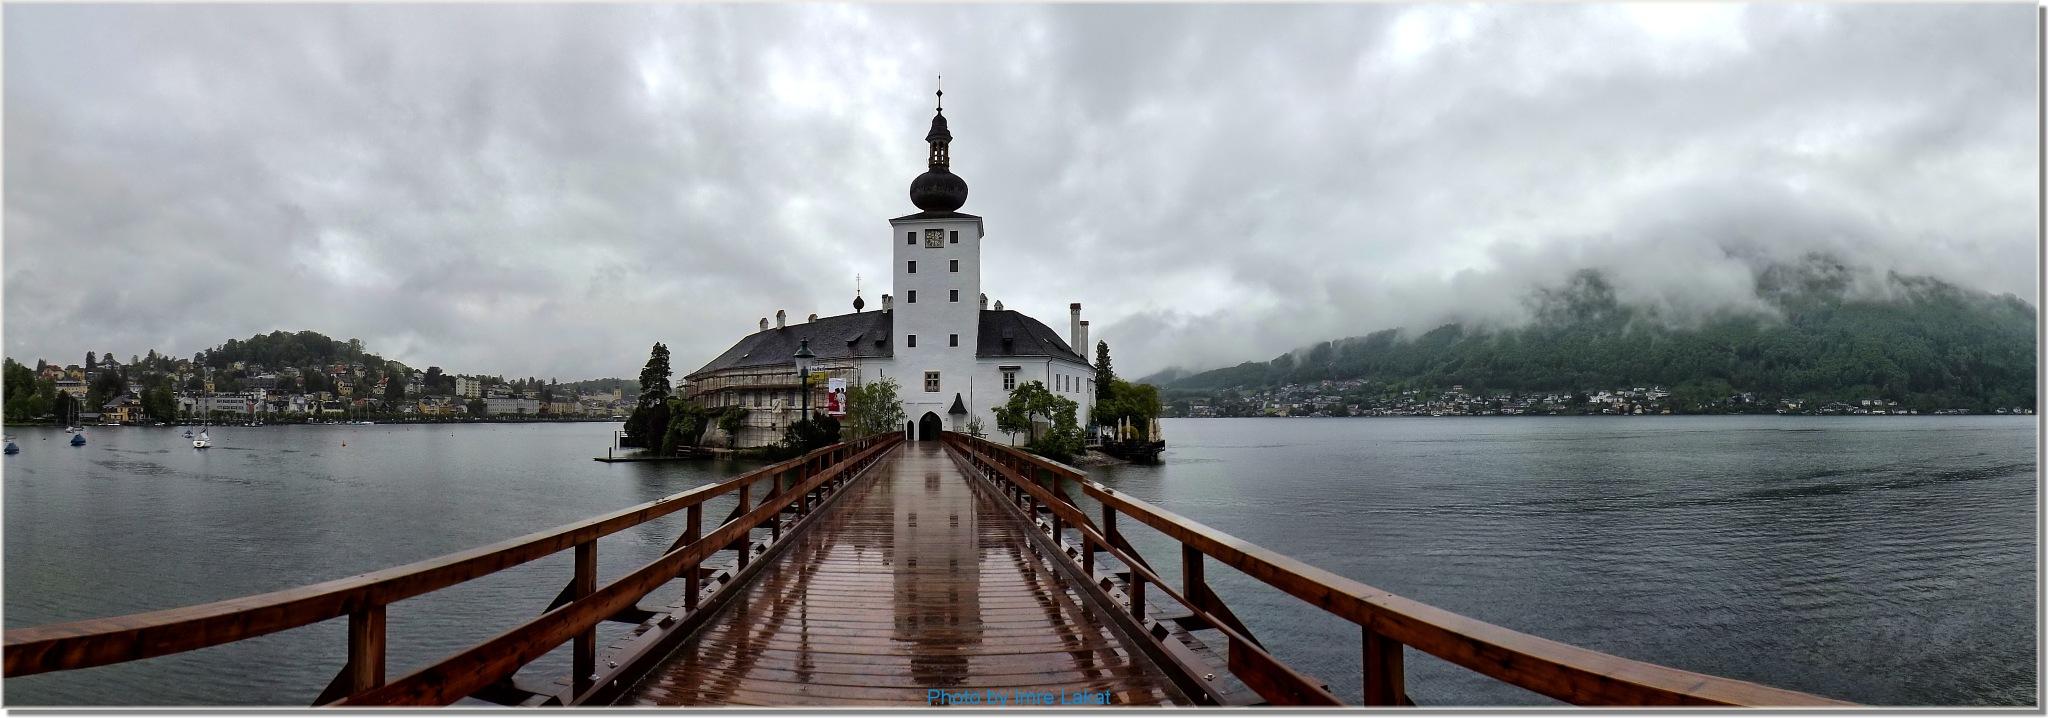 Schloss Ort 1, 4810 Gmunden, Ausztria by Imre Lakat